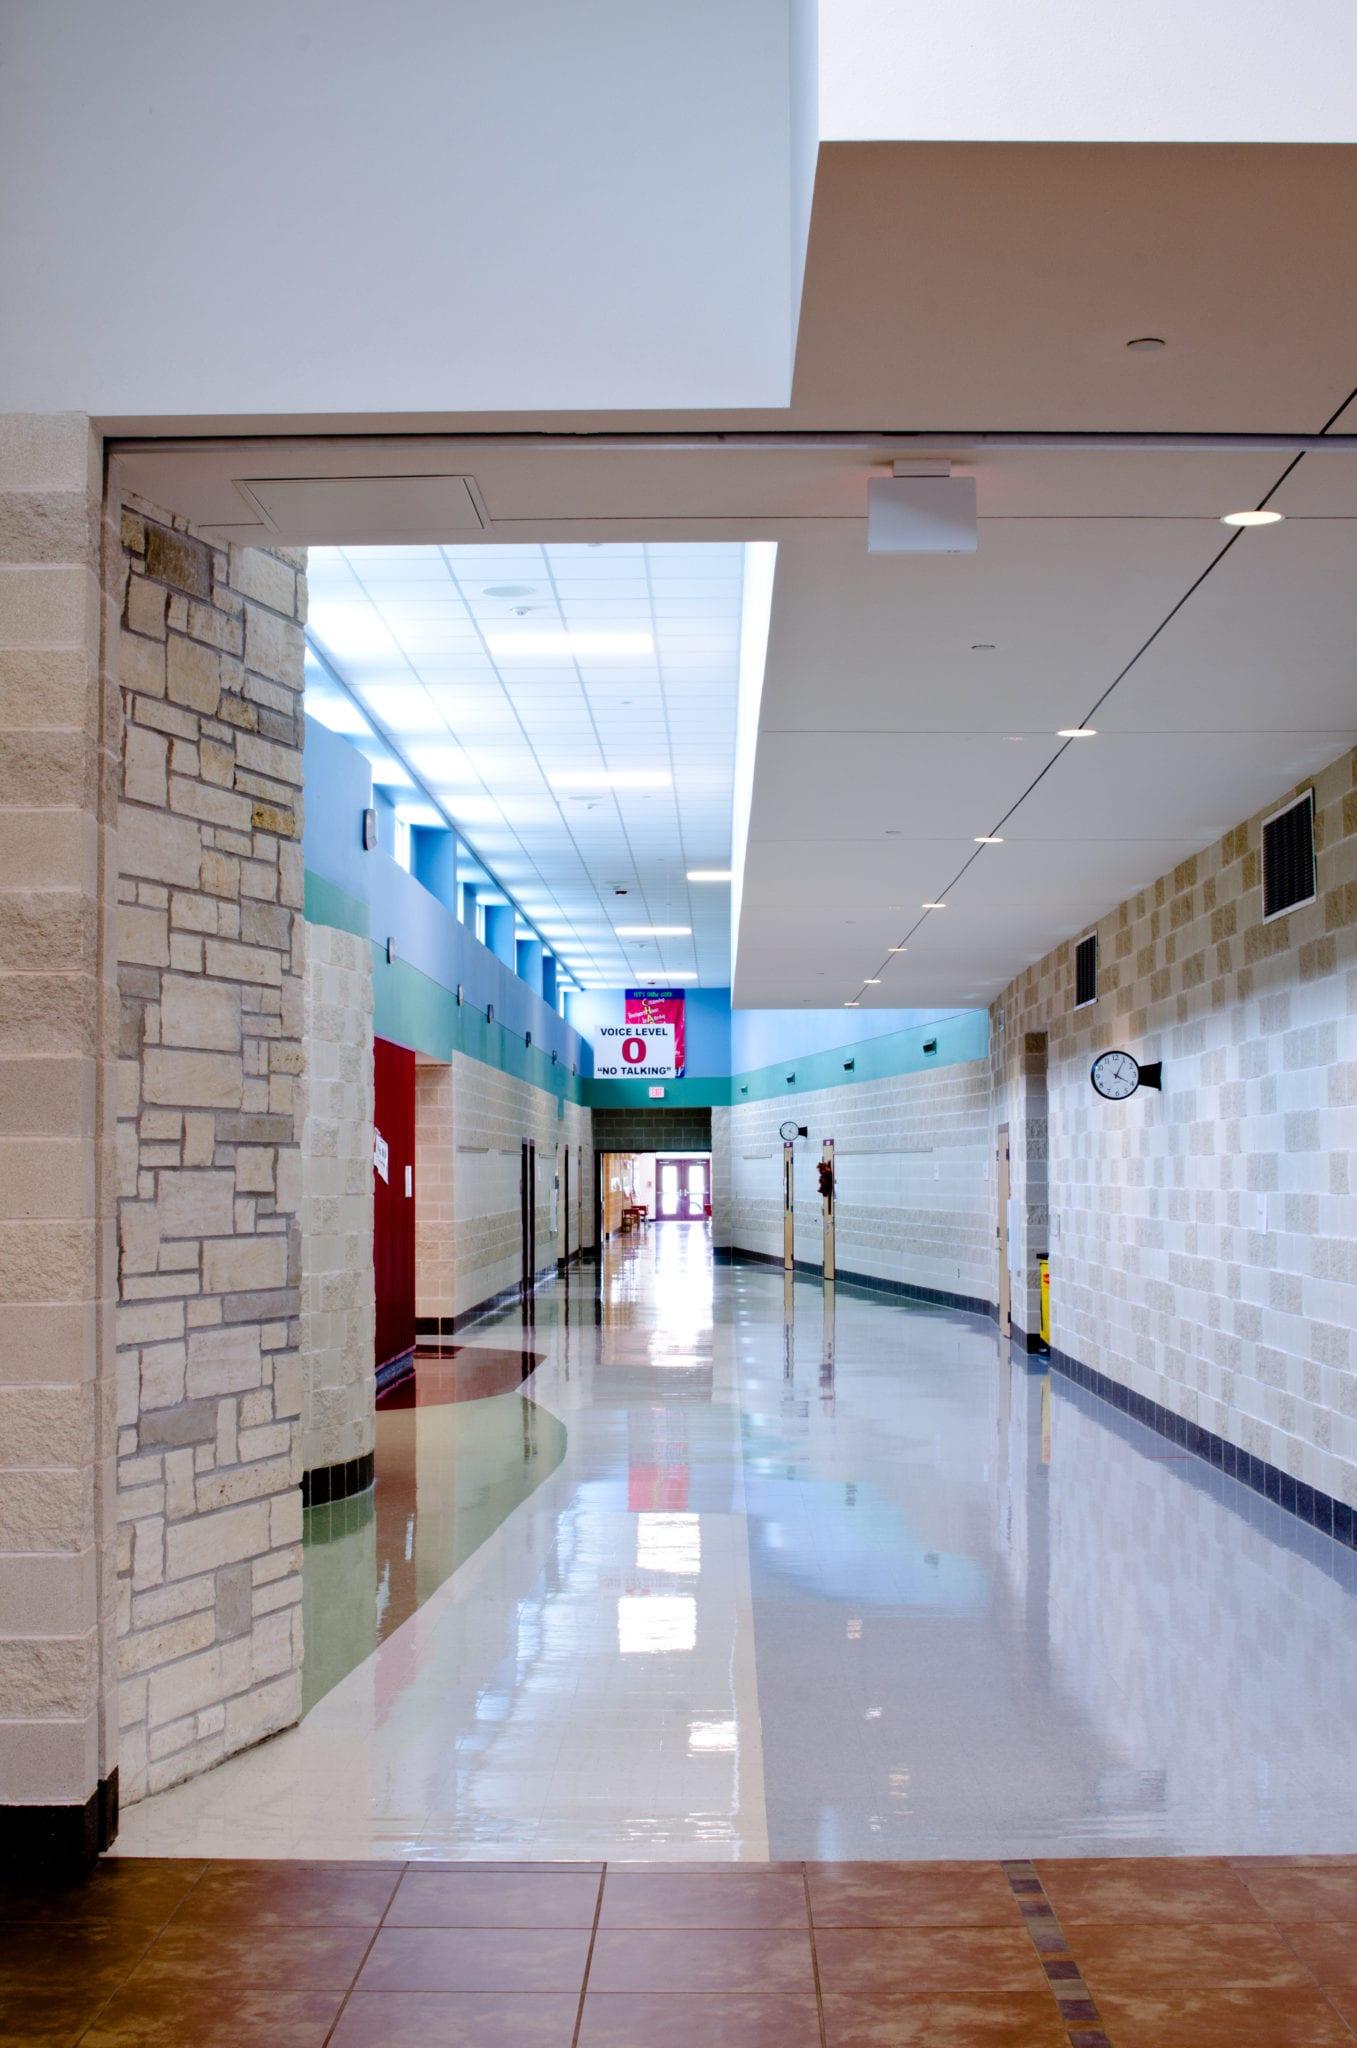 Tarver Elementary School - Barid Williams Construction